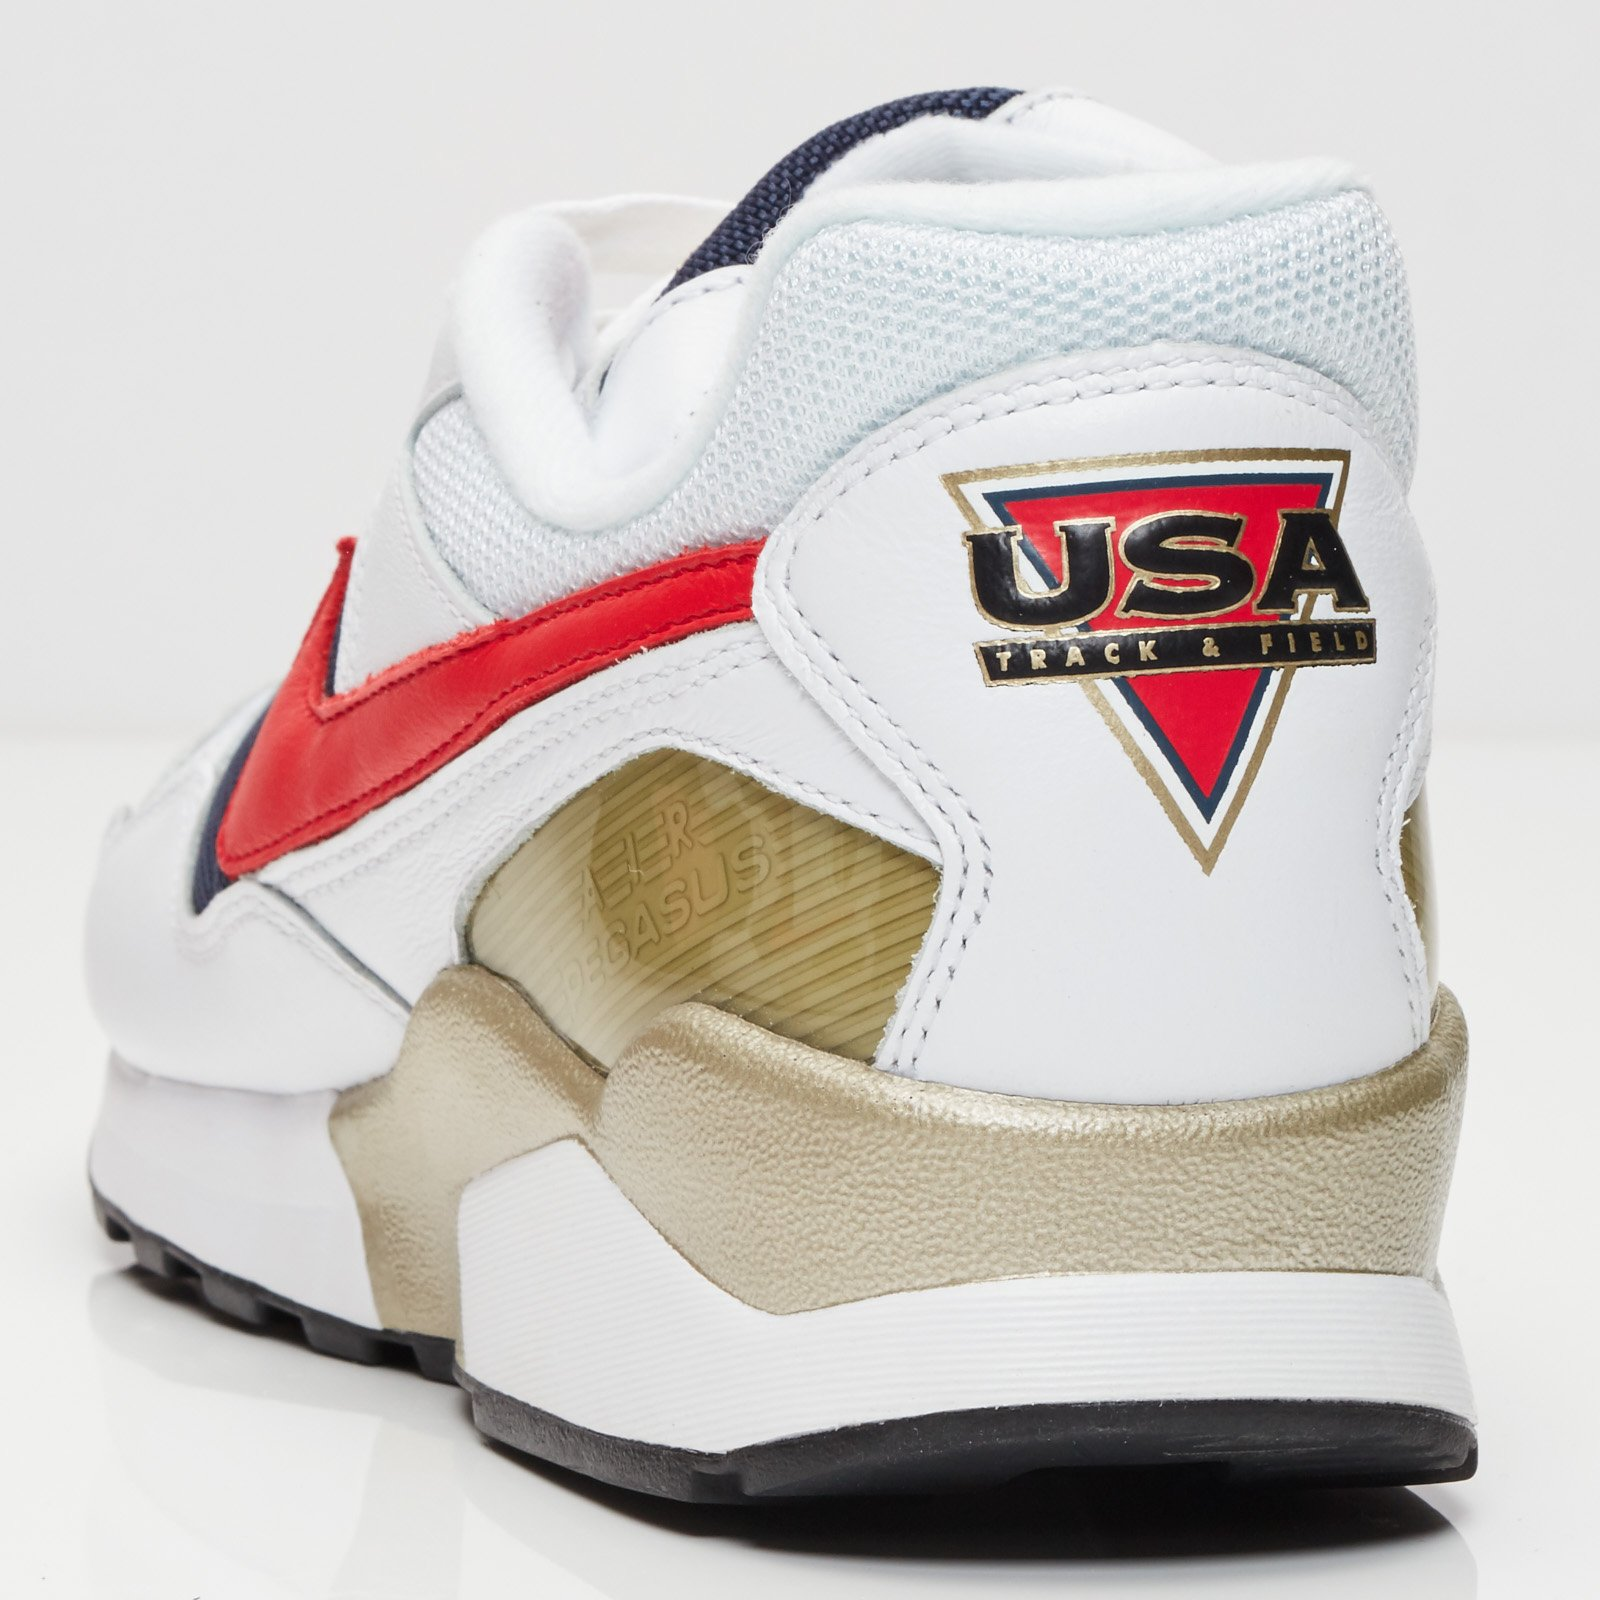 de1d2a0ab8c7 Nike Air Pegasus 92 Premium - 844964-100 - Sneakersnstuff